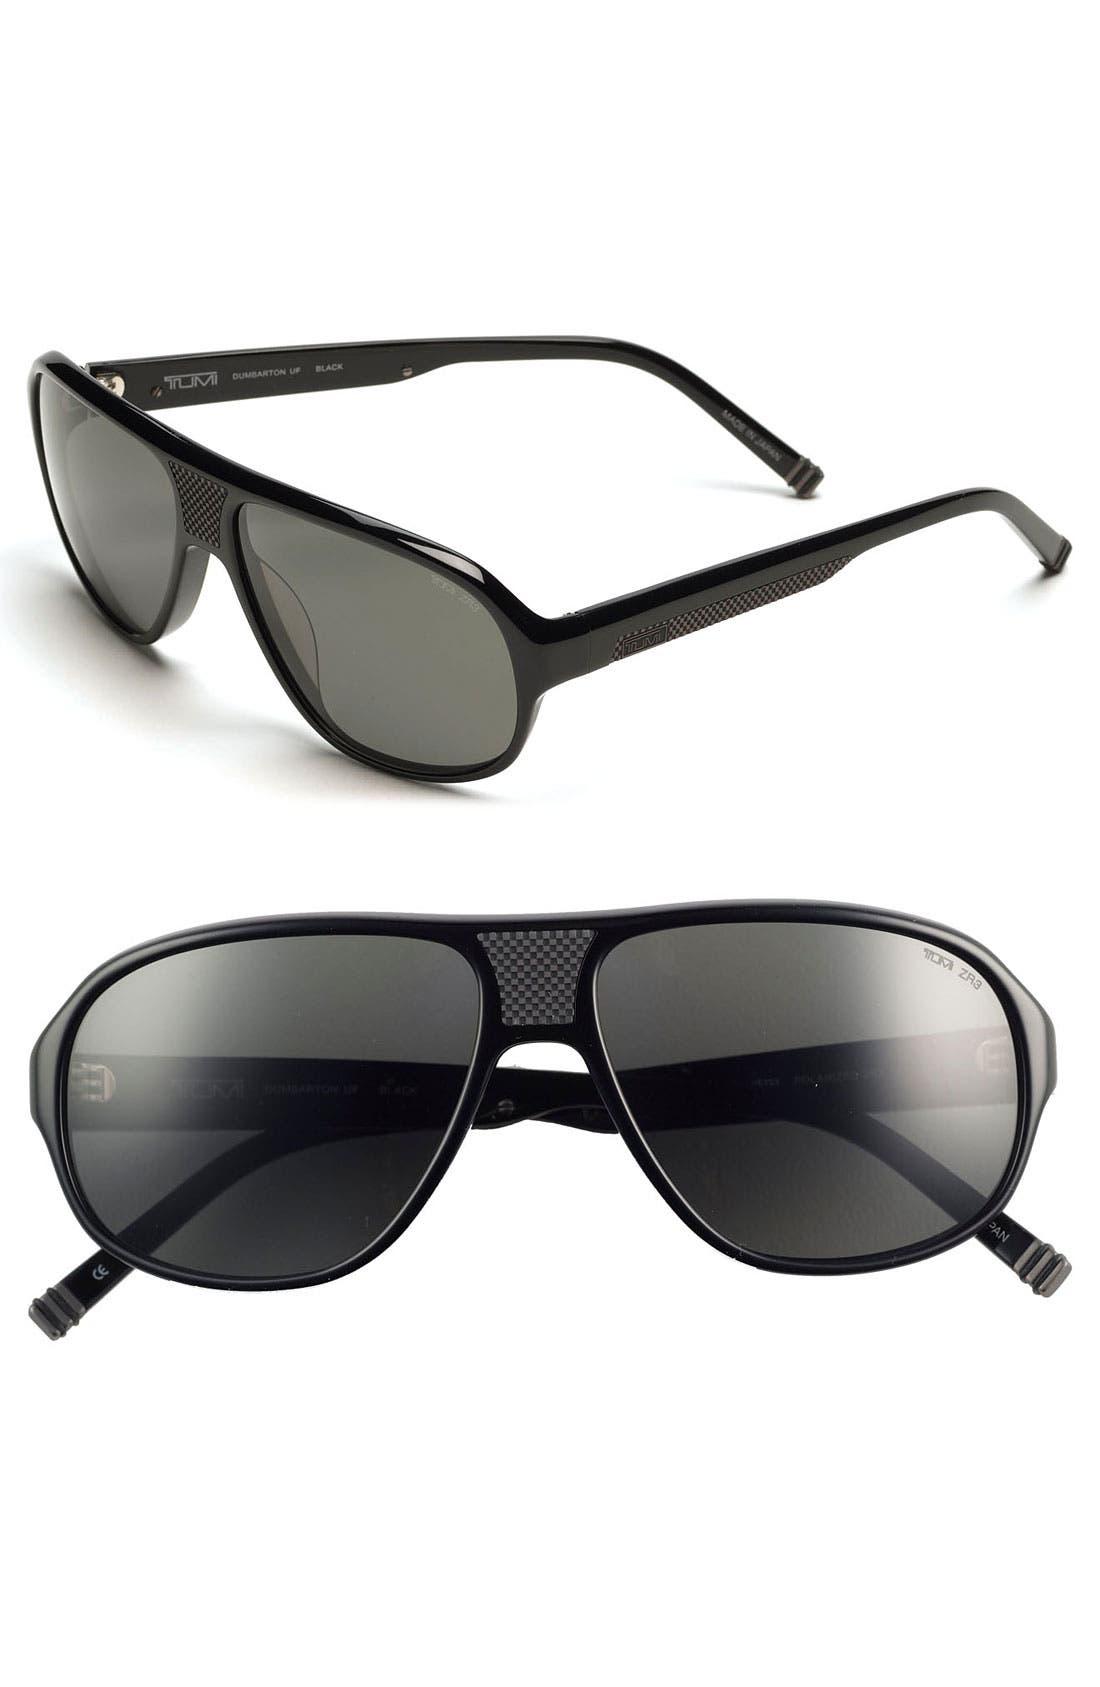 Main Image - Tumi 'Dumbarton' 59mm Sunglasses